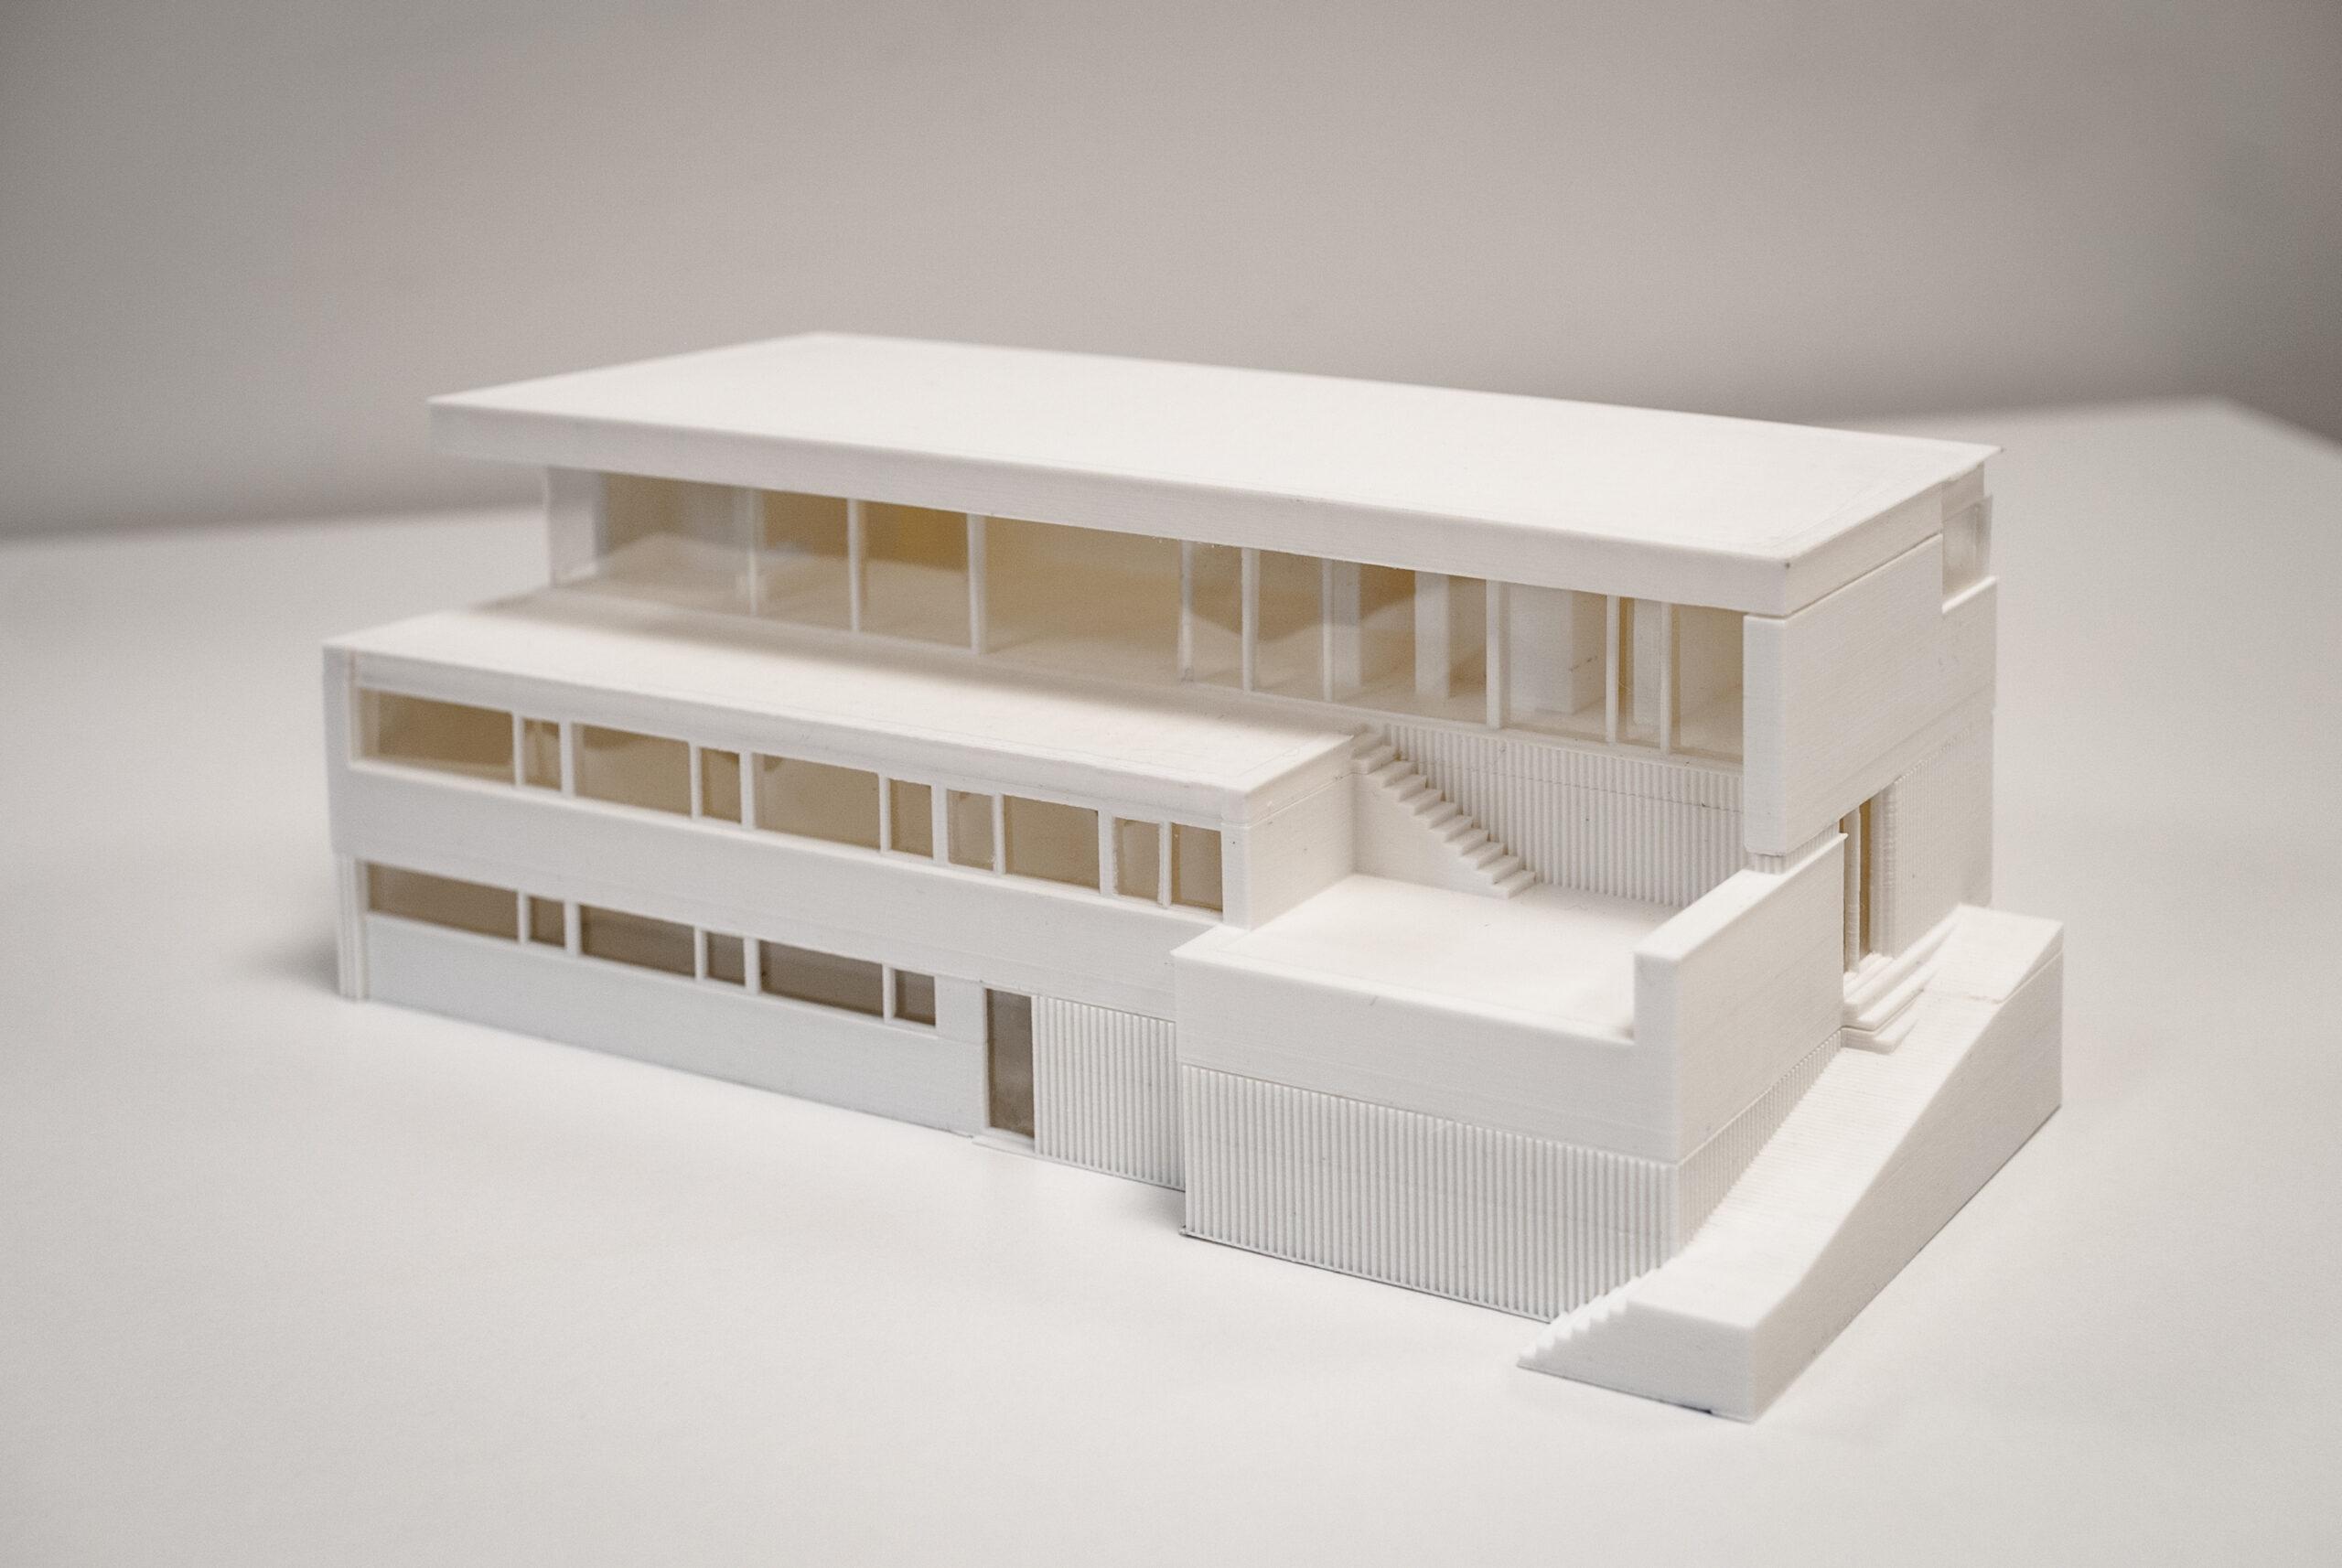 Maquette van woning met kantoorruimte